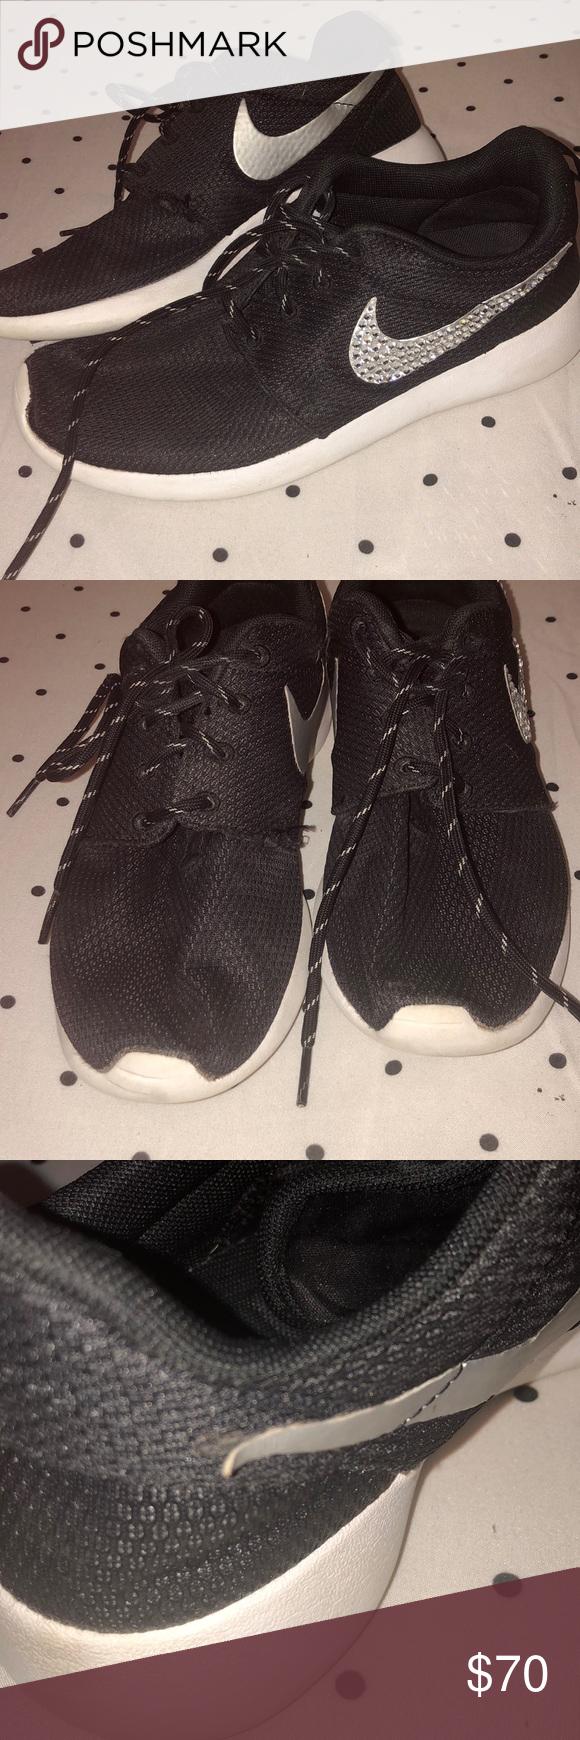 Rhinestone Nike Roshe Black Nike Roshe with Rhinestone Nike Logo on Sides -  Size 6 - 47f9fb6222d7